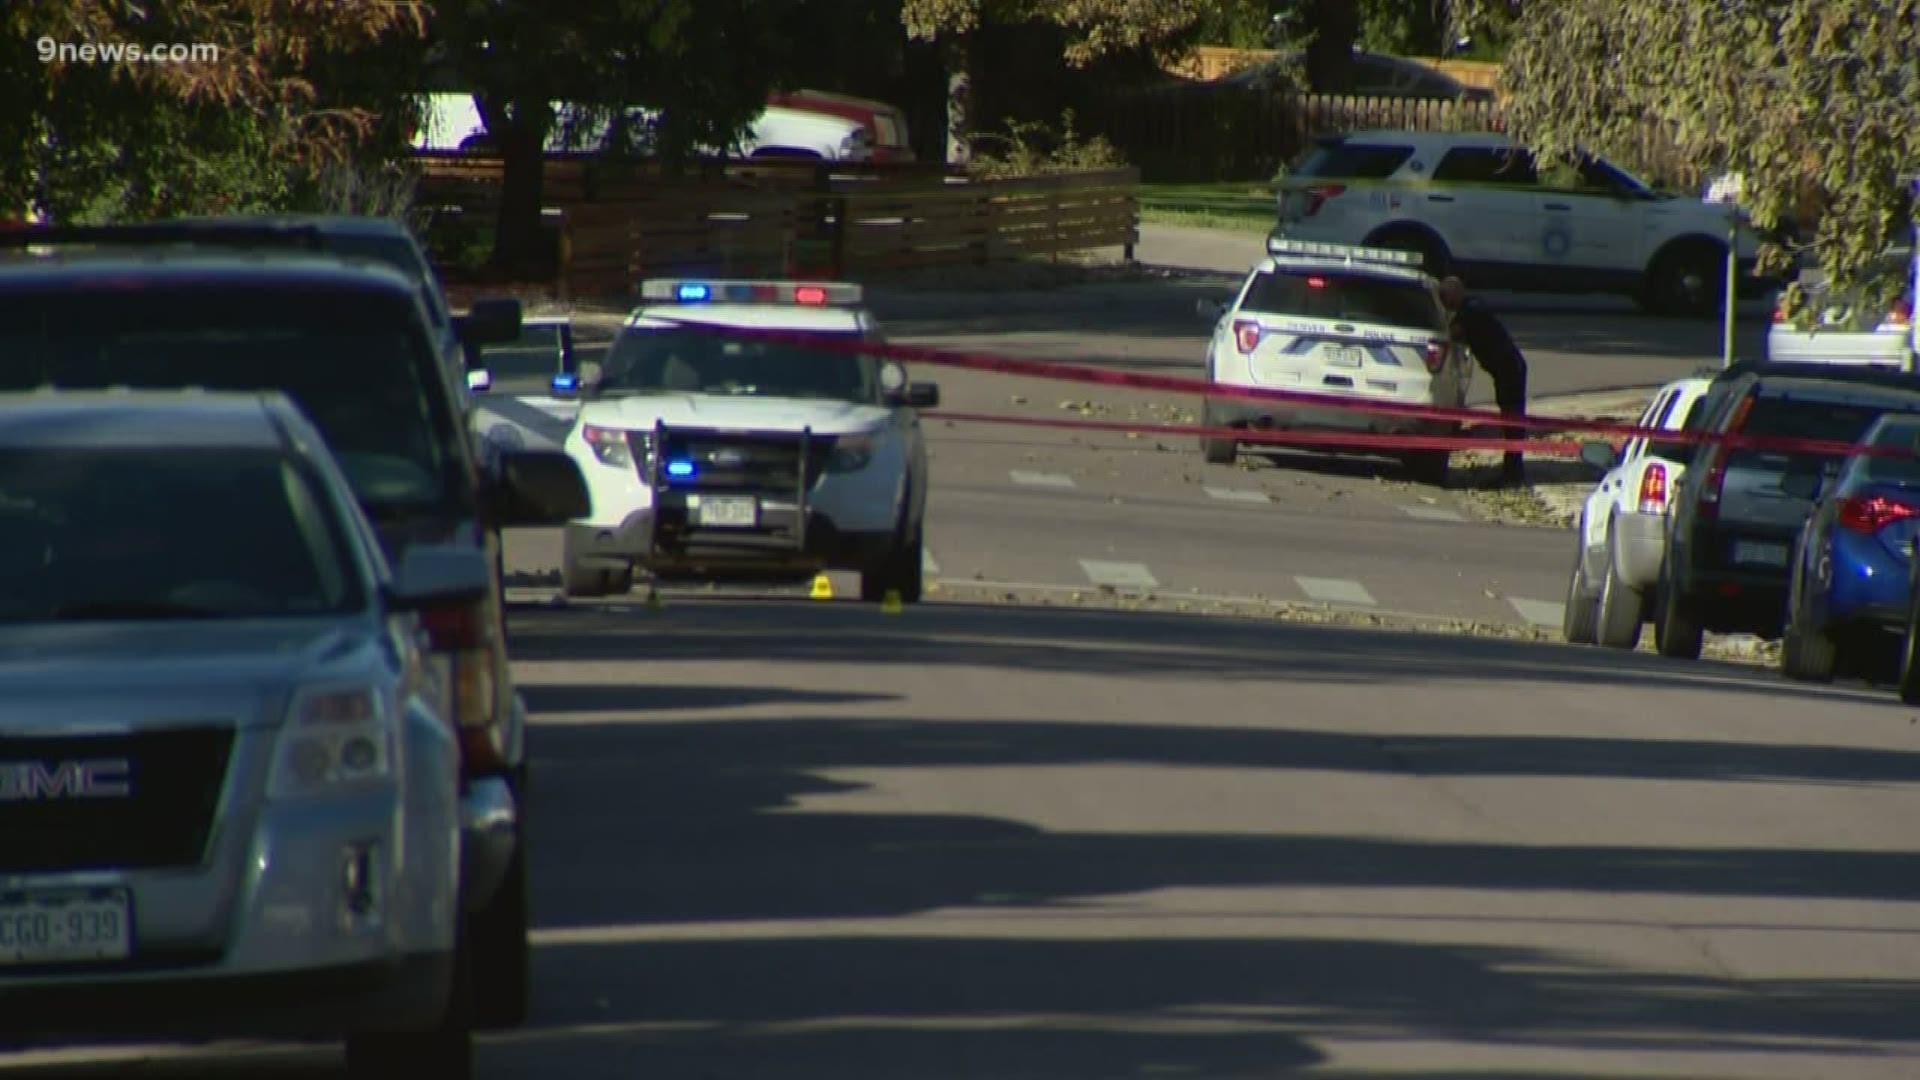 Cop Guns Down Mentally Ill, Unarmed, Naked Veteran in